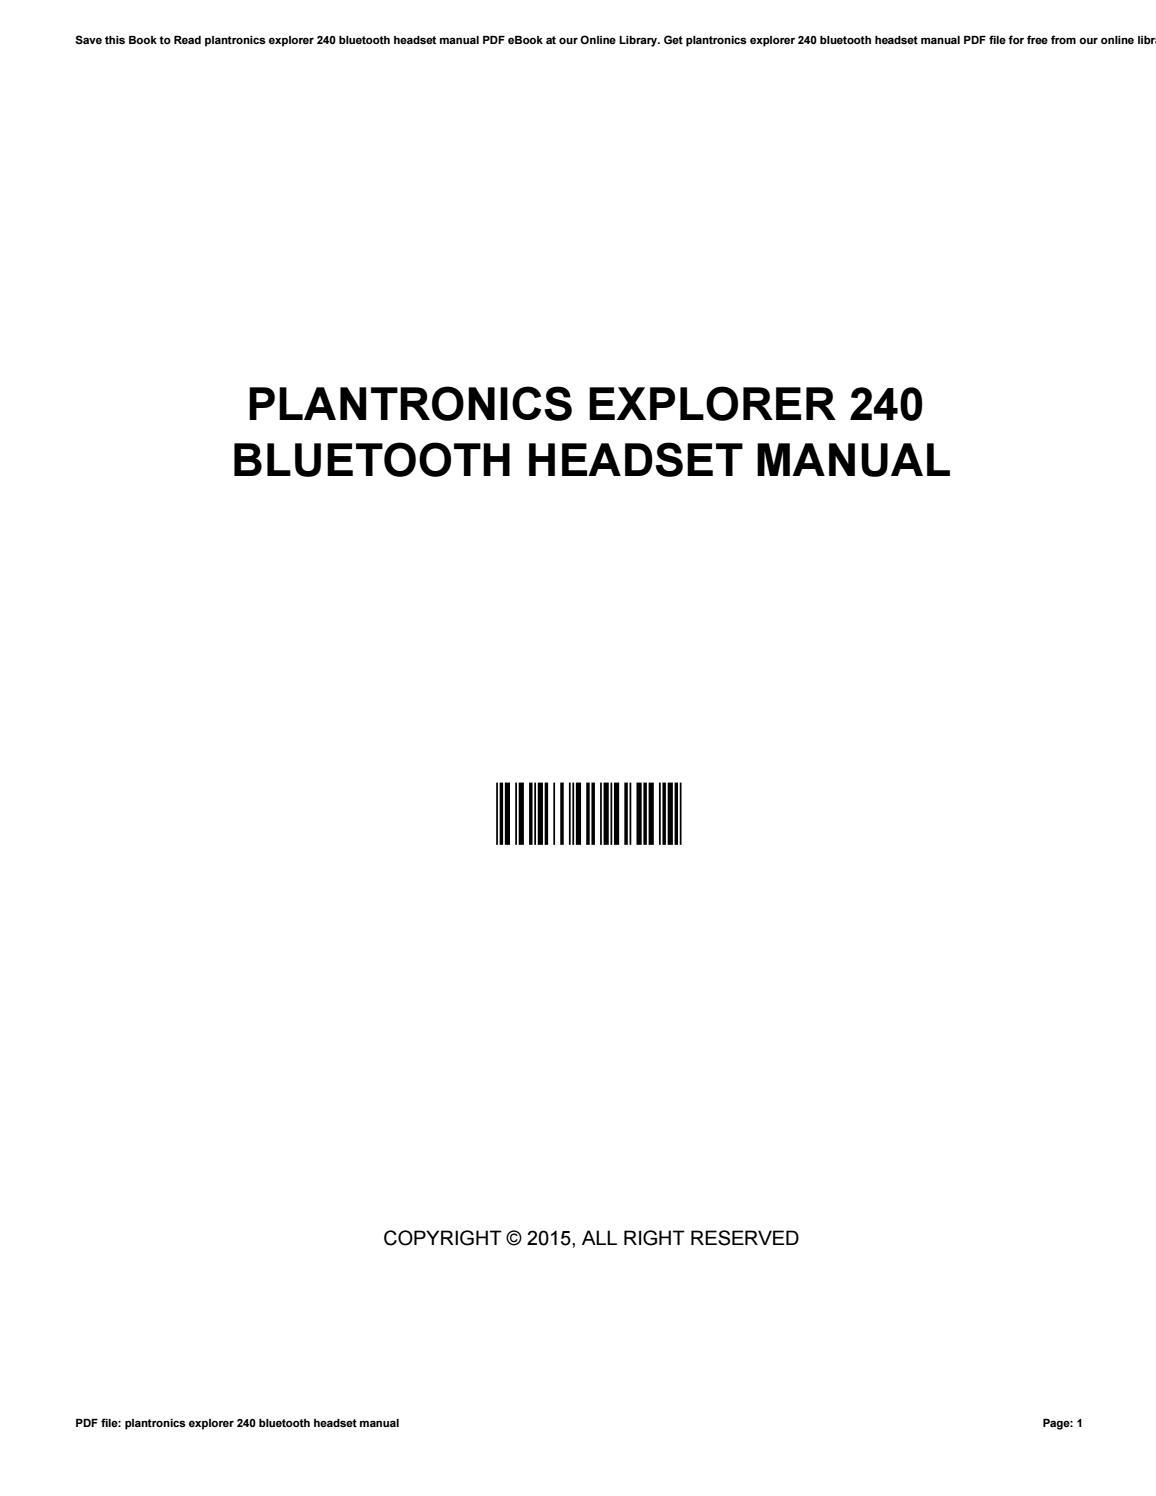 Plantronics Explorer 240 Bluetooth Headset Manual By O085 Issuu